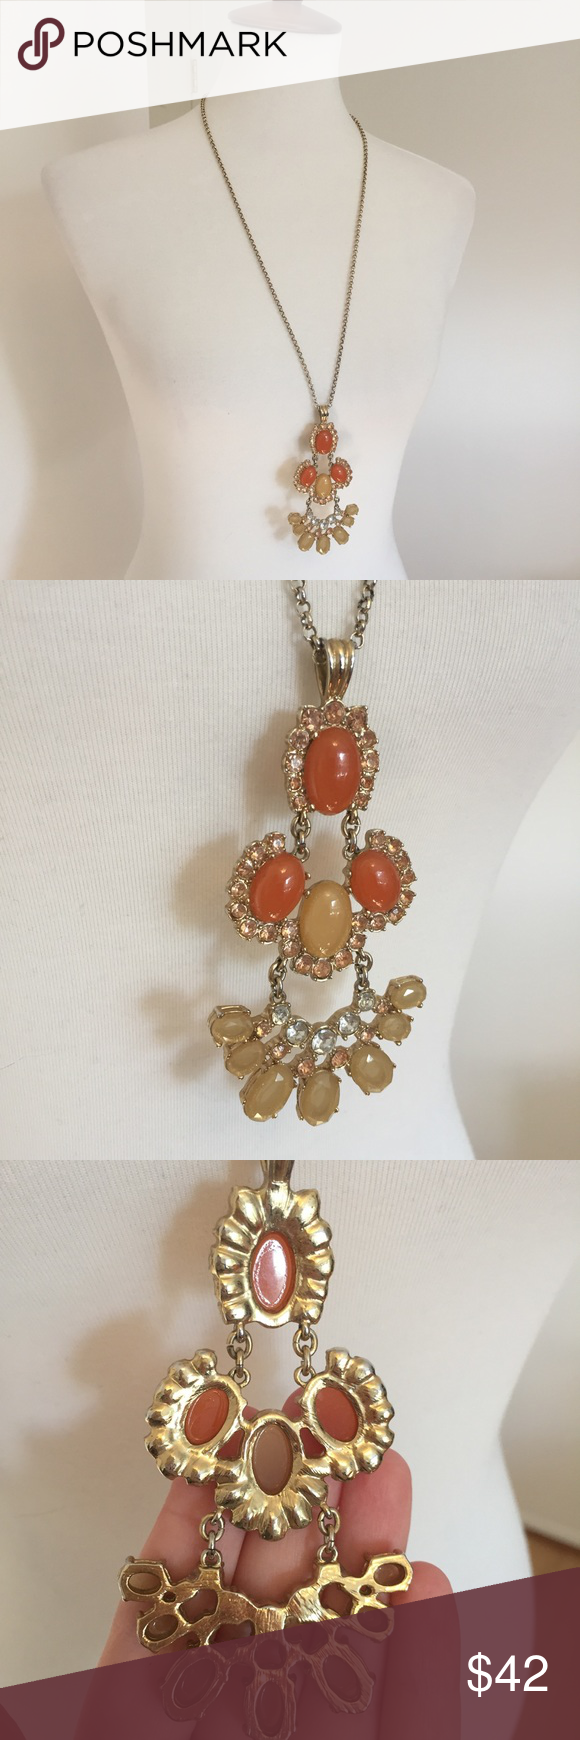 Jewelry sale j crew u pendant necklace my posh picks pinterest